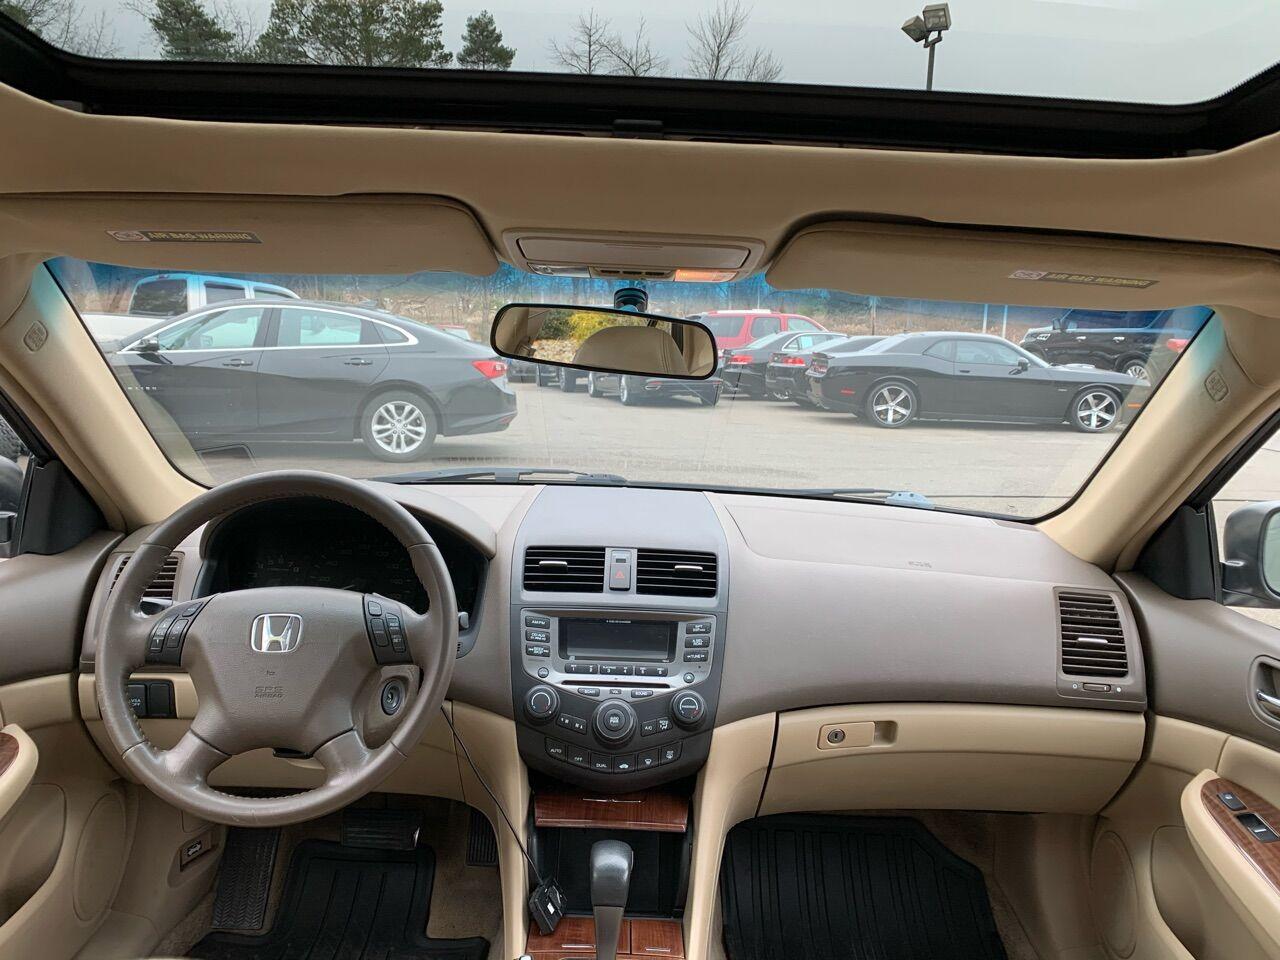 2006 Honda Accord 4dr Car